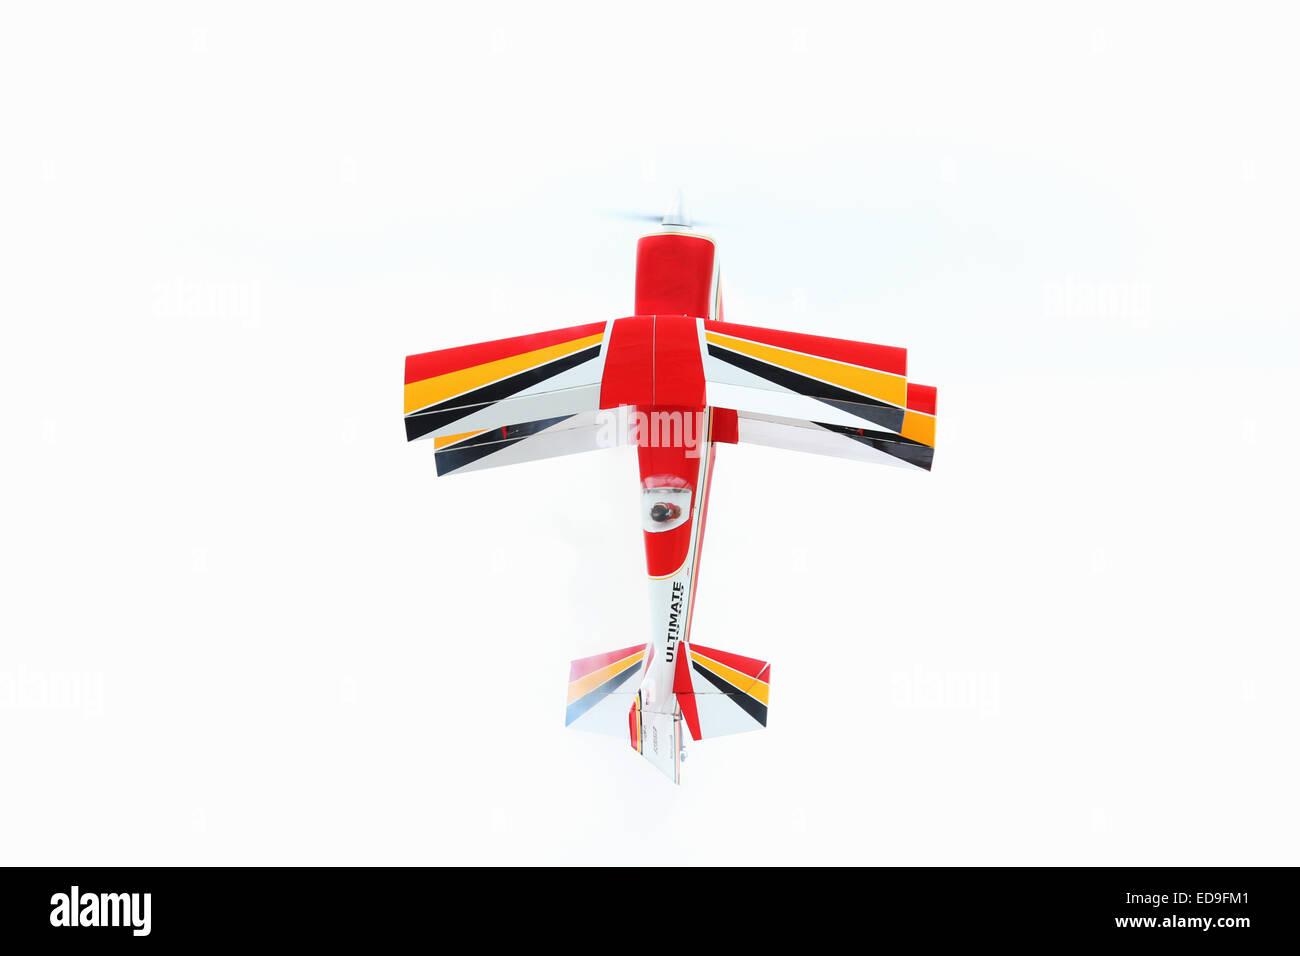 Hanging on the propeller. Ultimate 10-300 model radio control airplane. Bi Plane. Barnstorming Carnival, Springfield - Stock Image